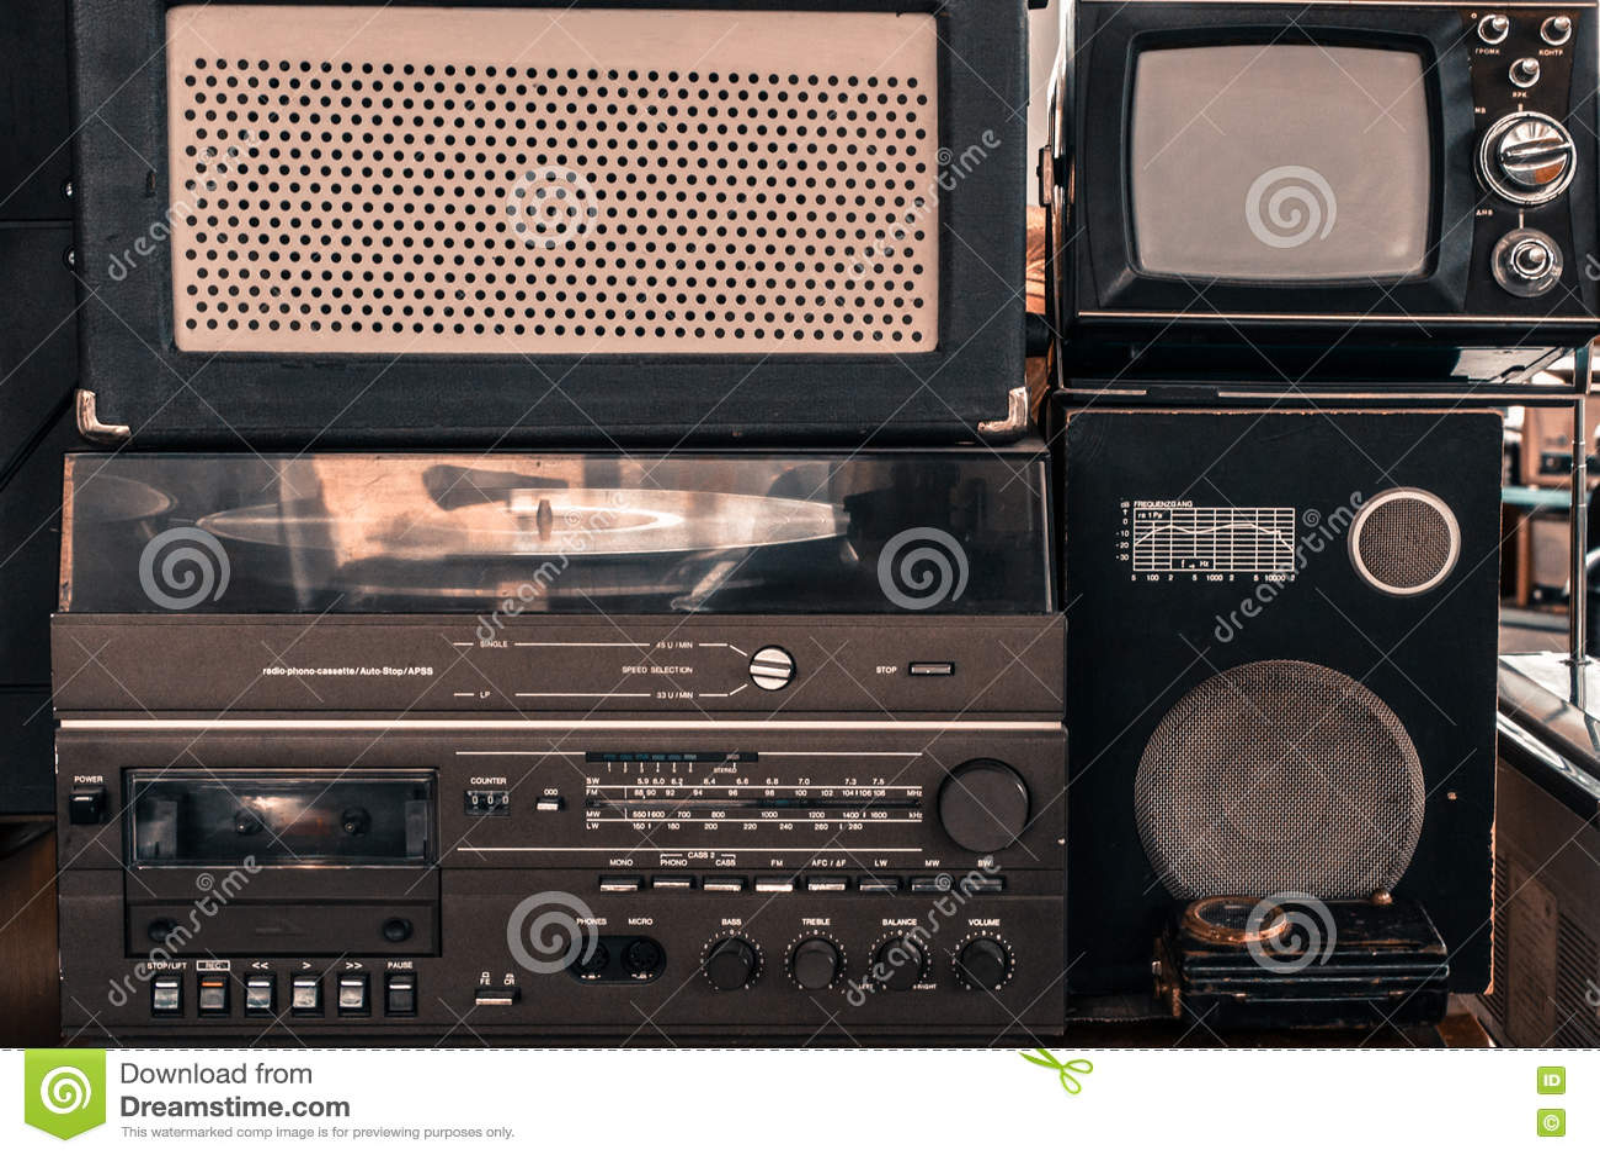 Retro audio system with radio, cassette tape recorder